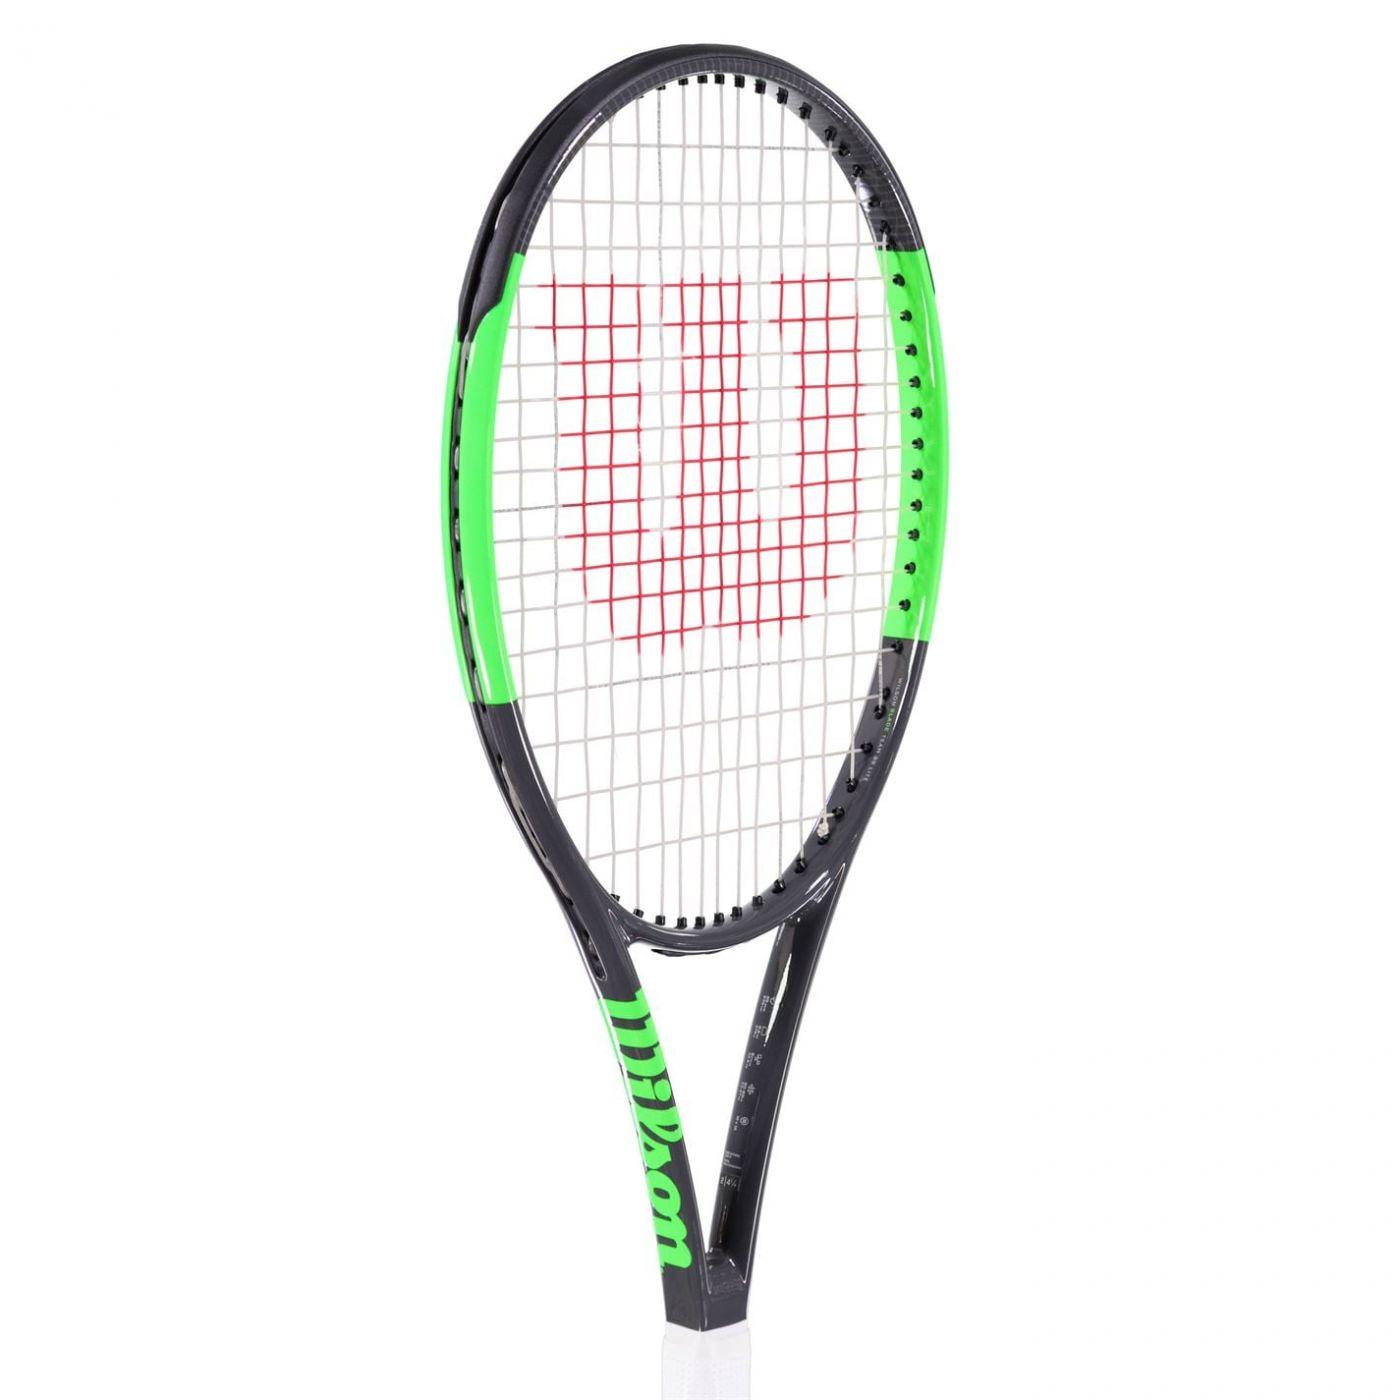 Wilson Bla Lit Racket C99